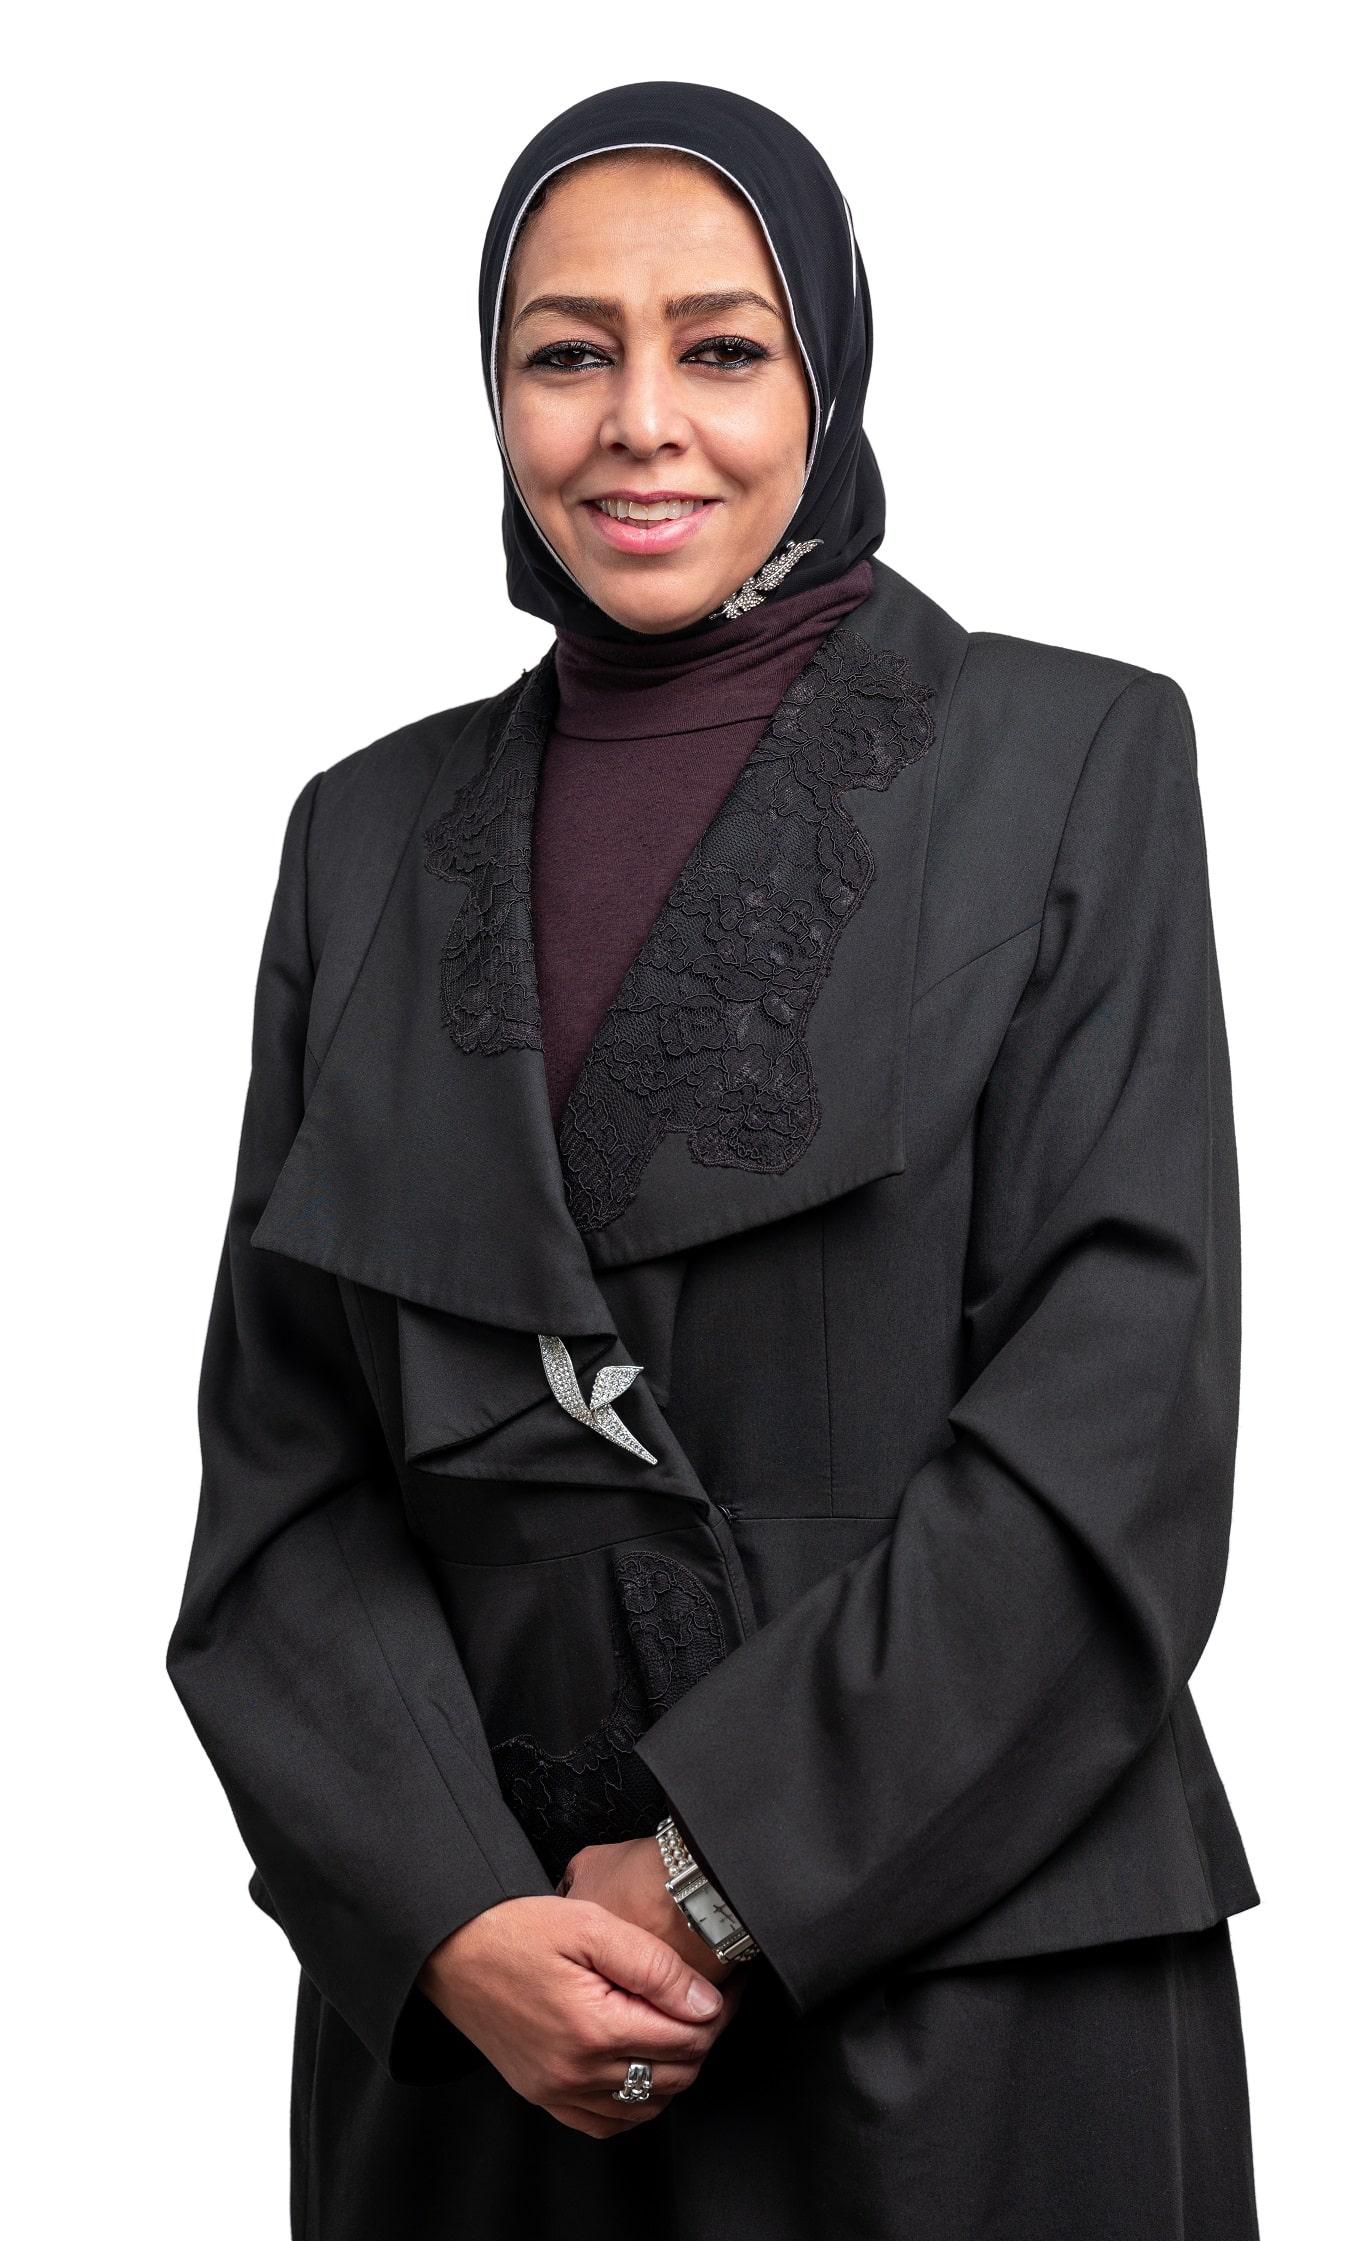 د. شهد محمود حسين